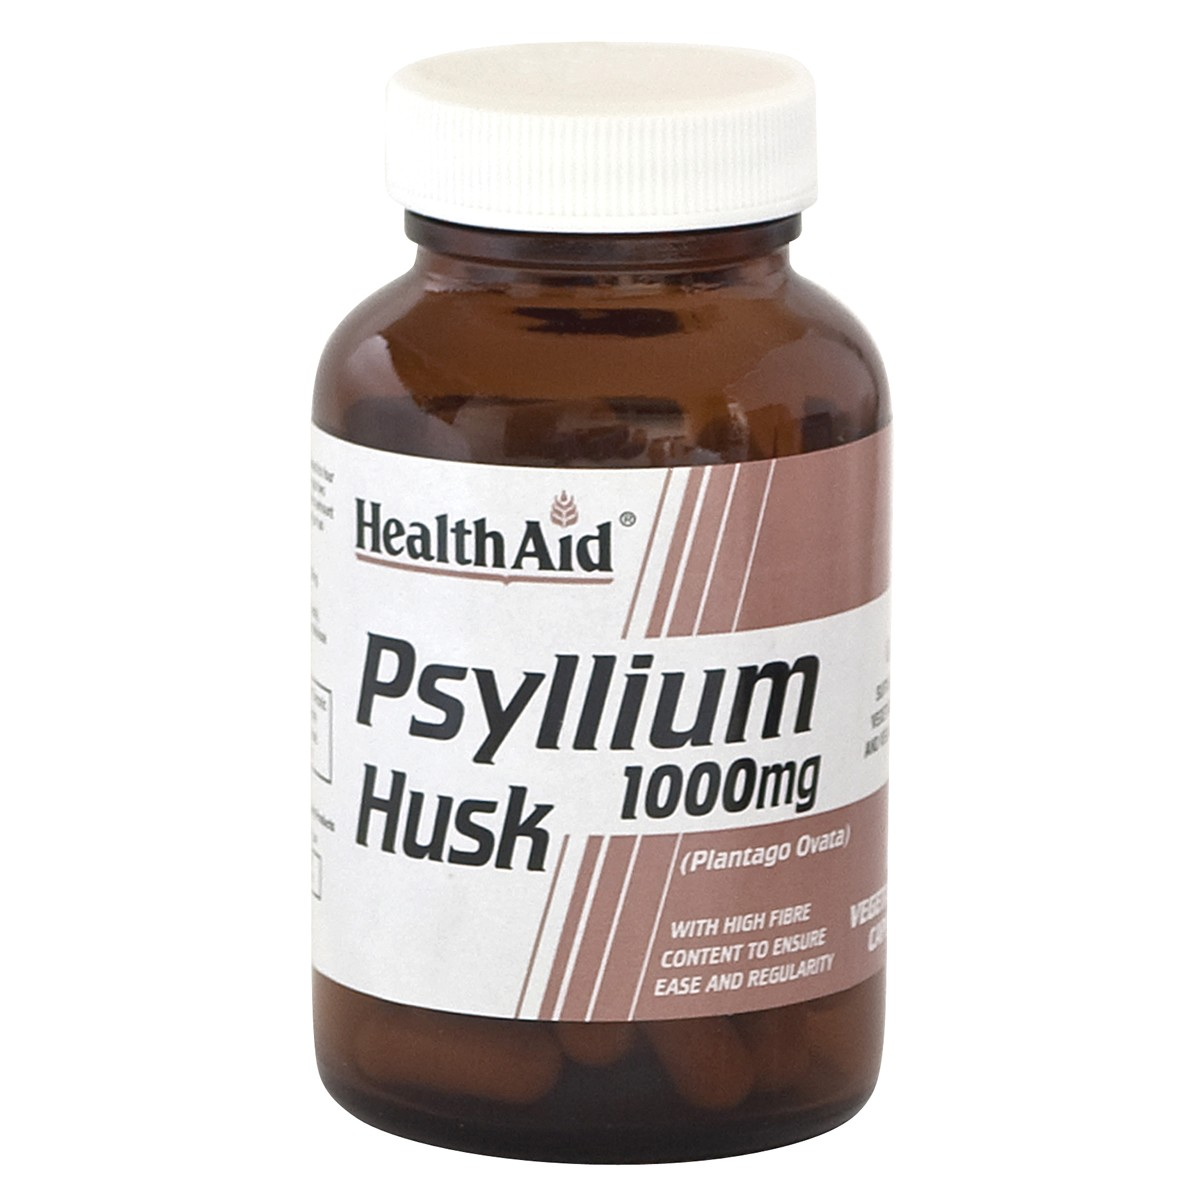 HealthAid Psyllium Husk 1000mg Vegicaps